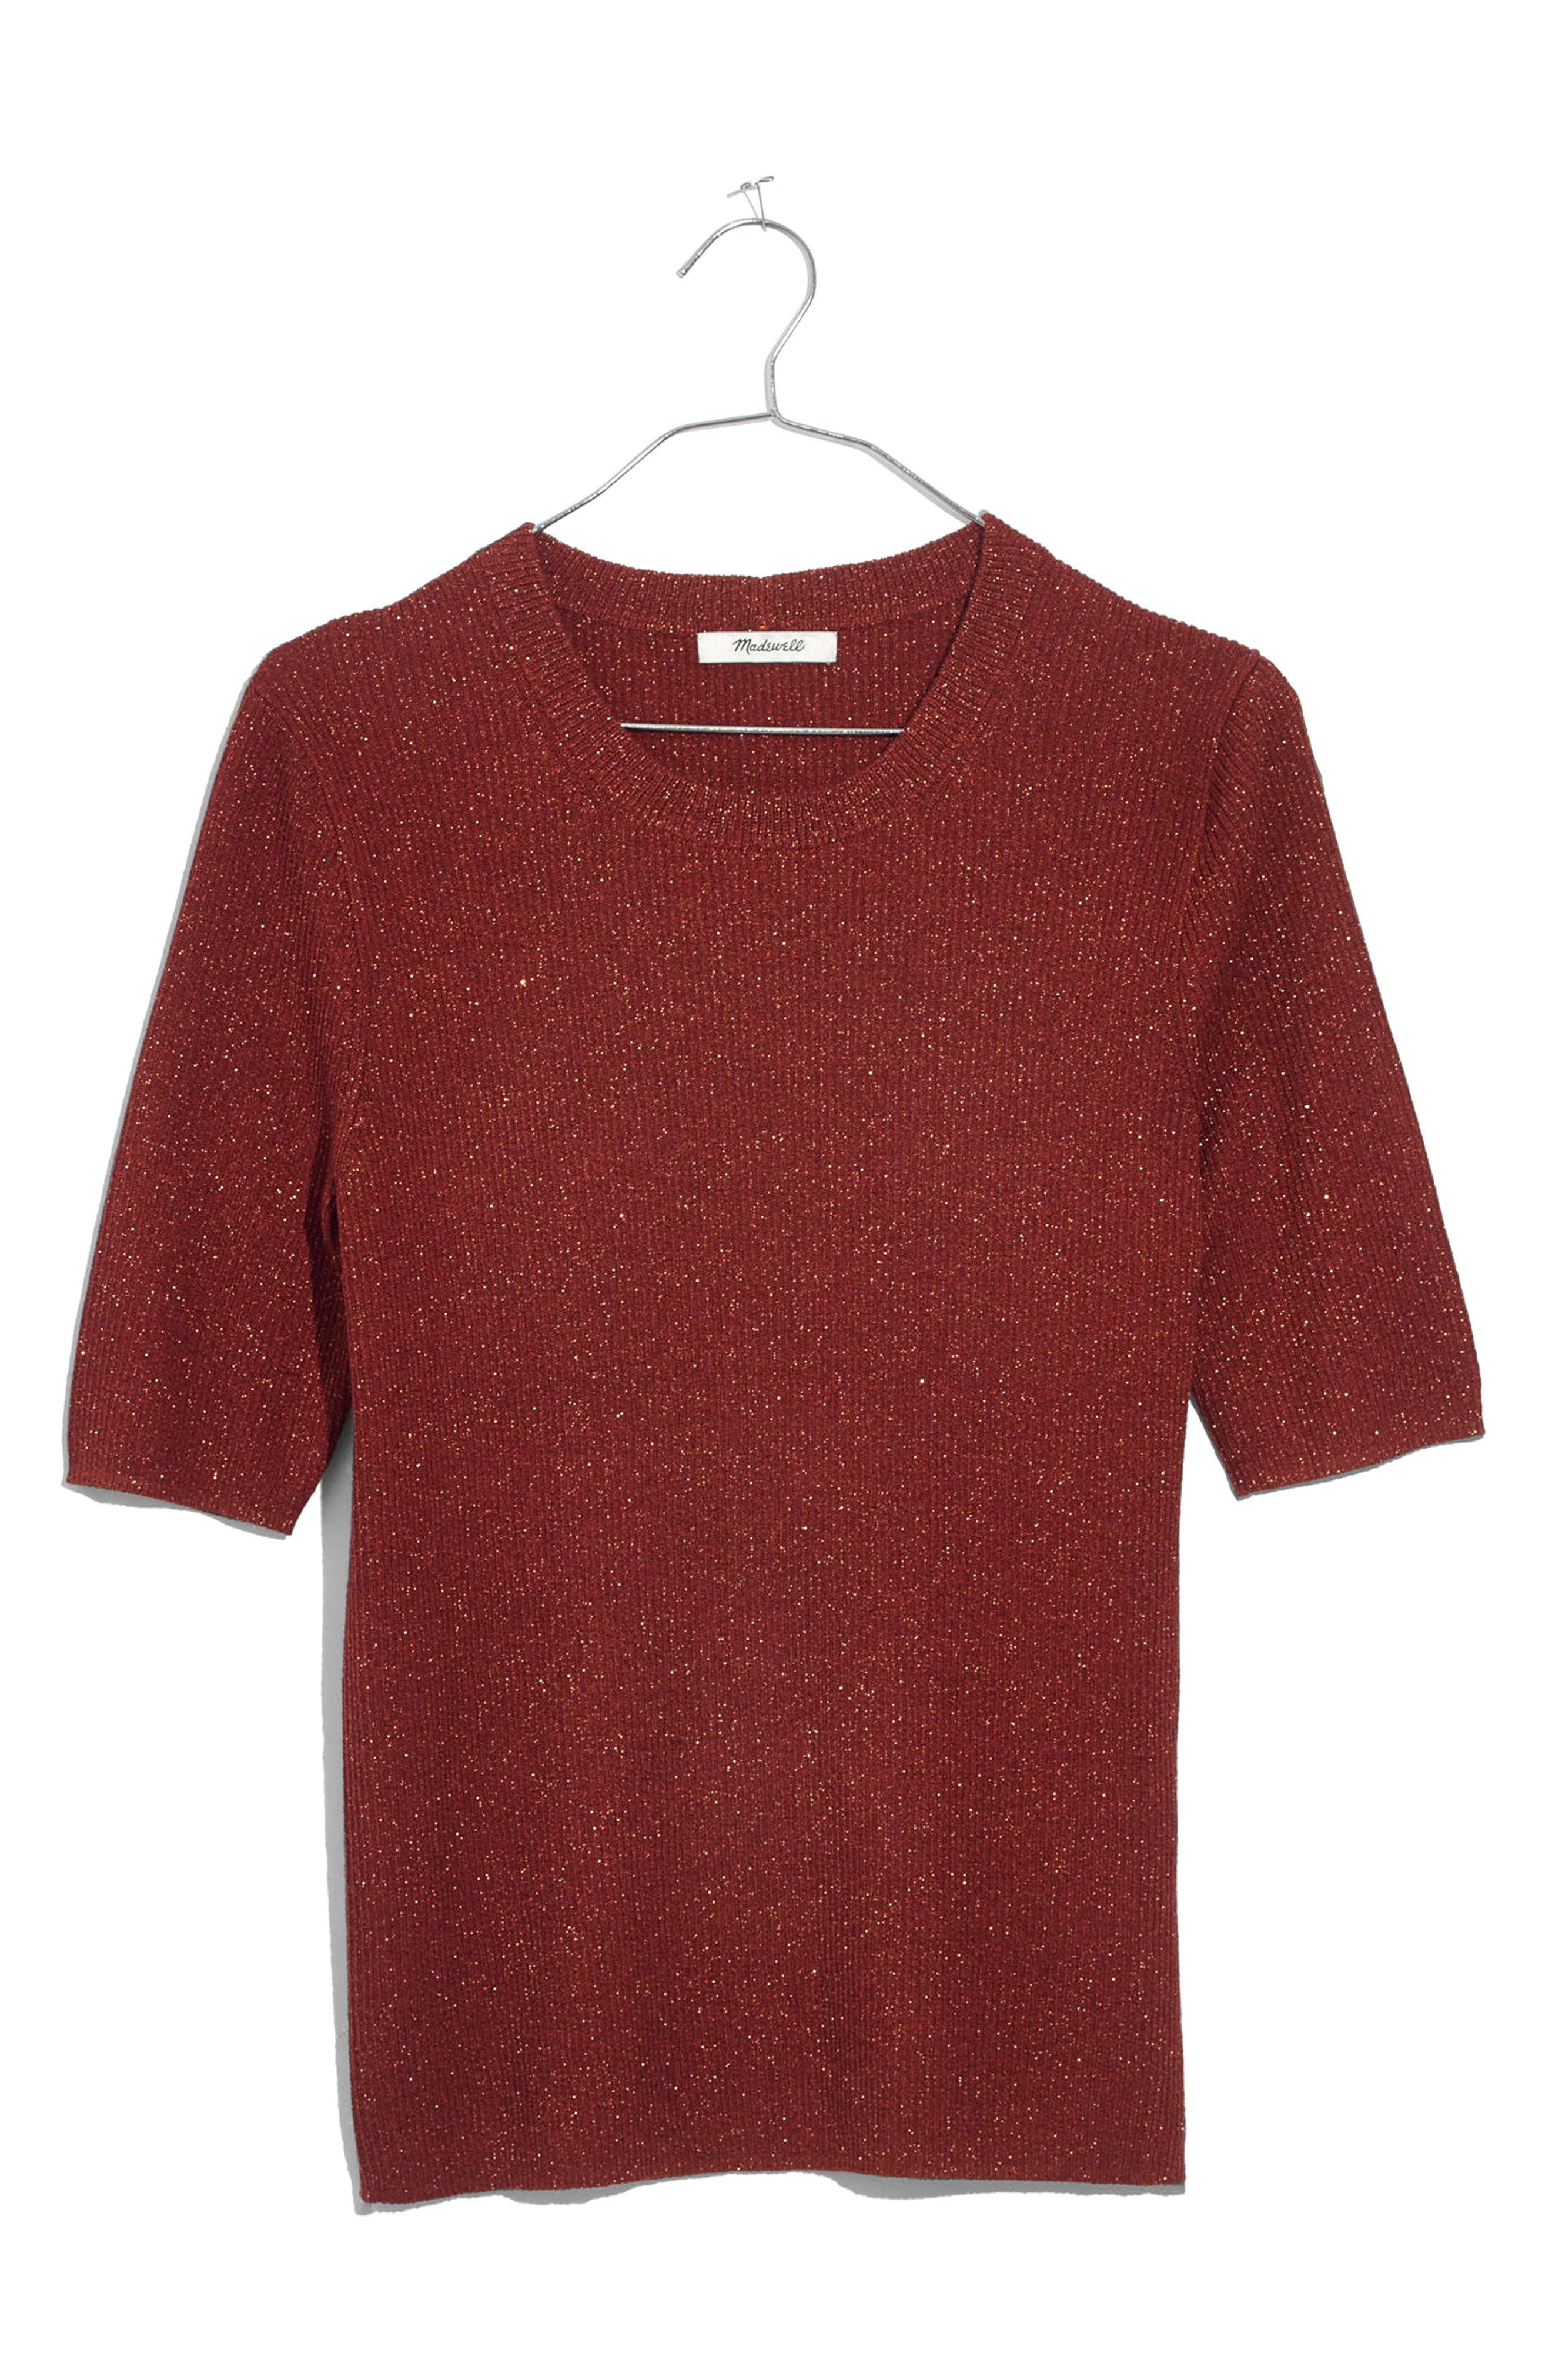 Madewell Rib Sweater